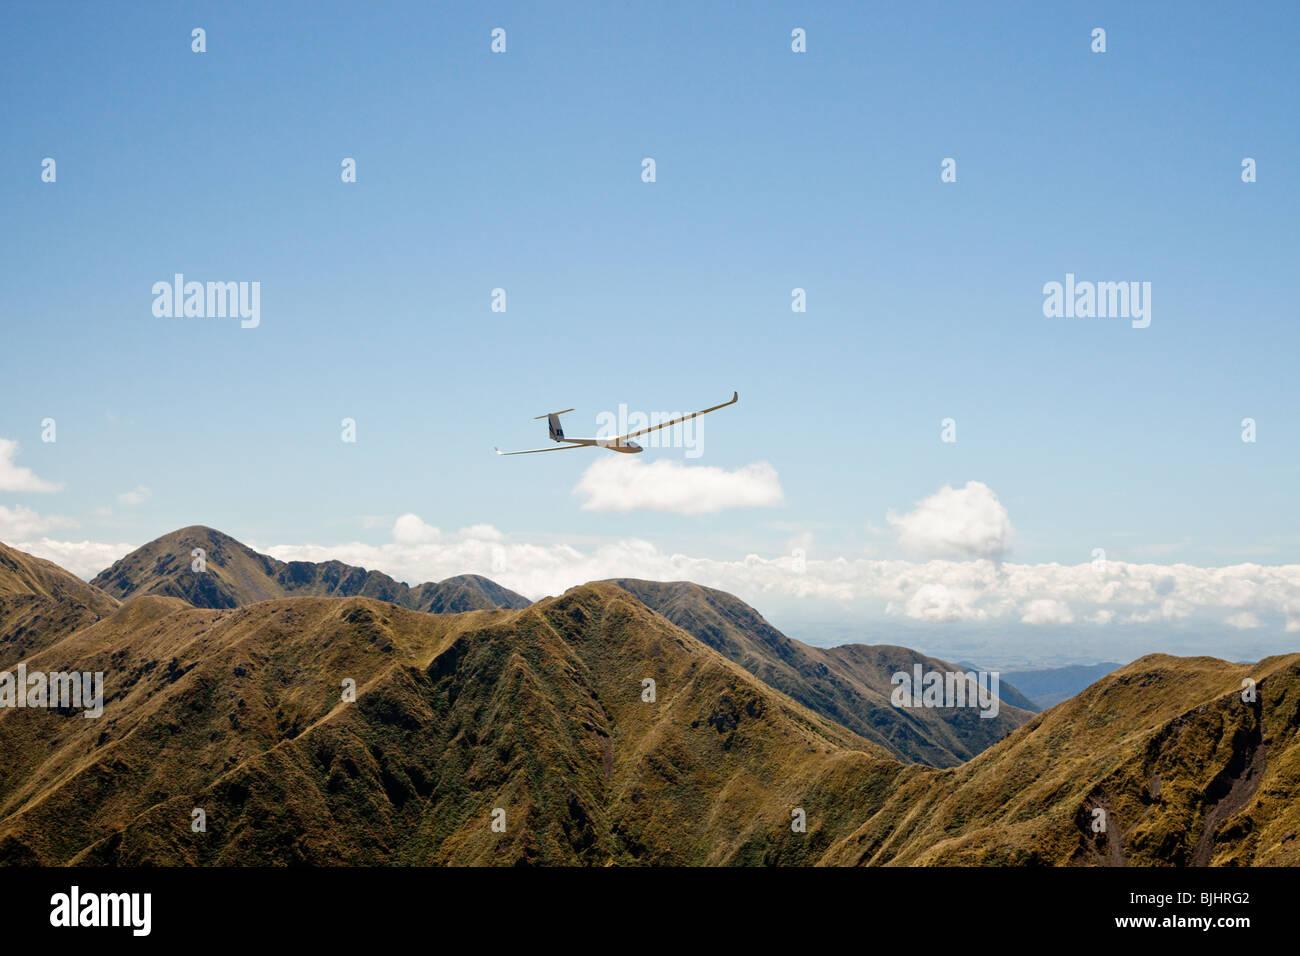 Glider flying over the Tararua Mountain Ranges, New Zealand - Stock Image